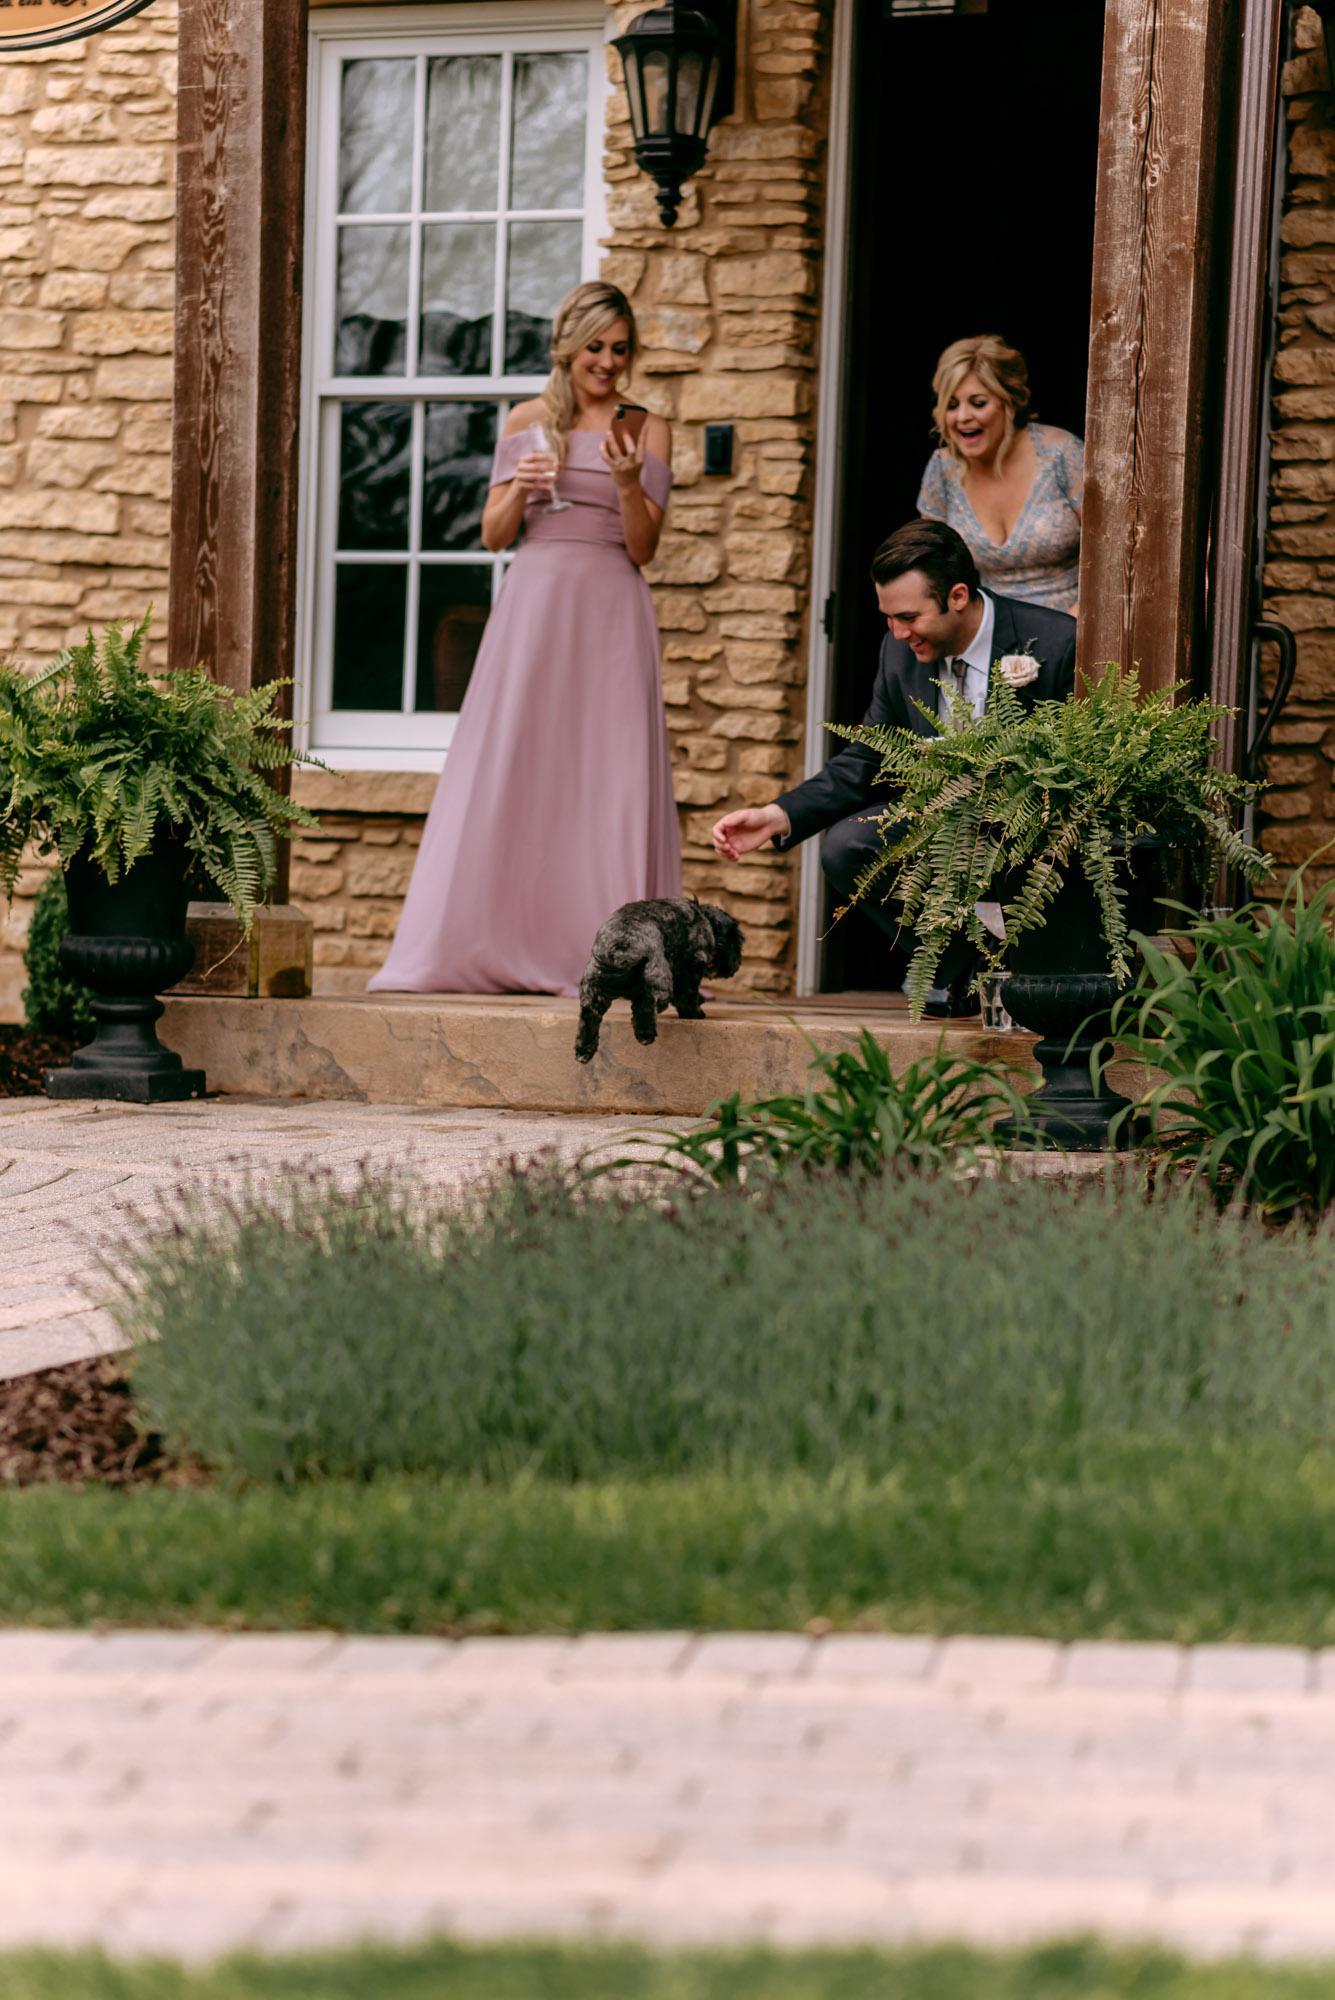 orchard-farms-pavillion-wedding-rockton-IL-wedding-photographers-219.jpg